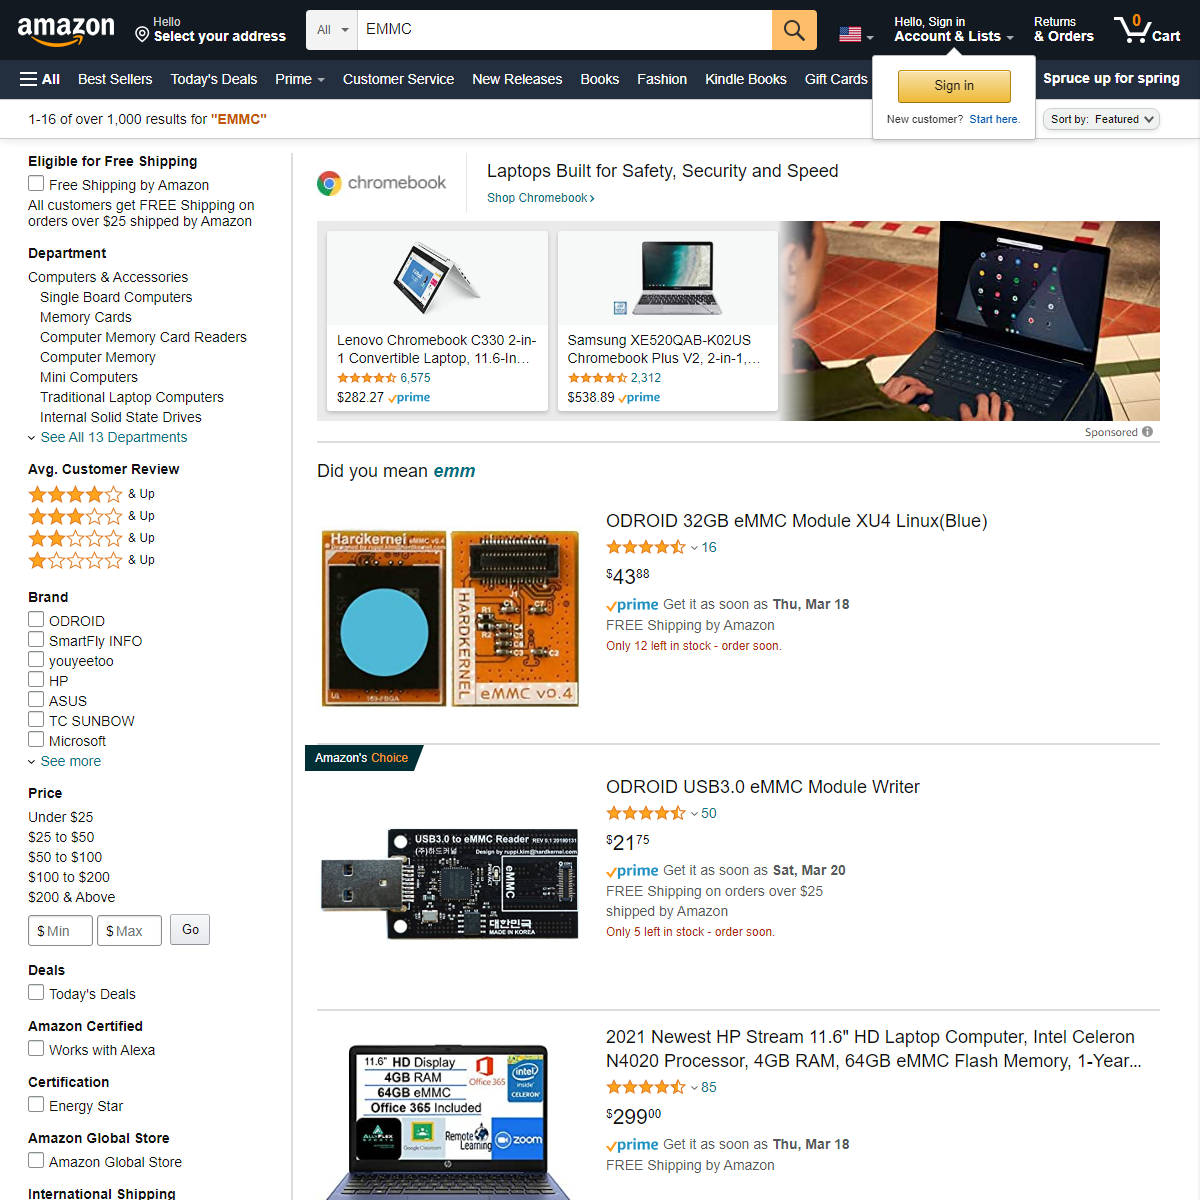 Amazon.com - EMMC